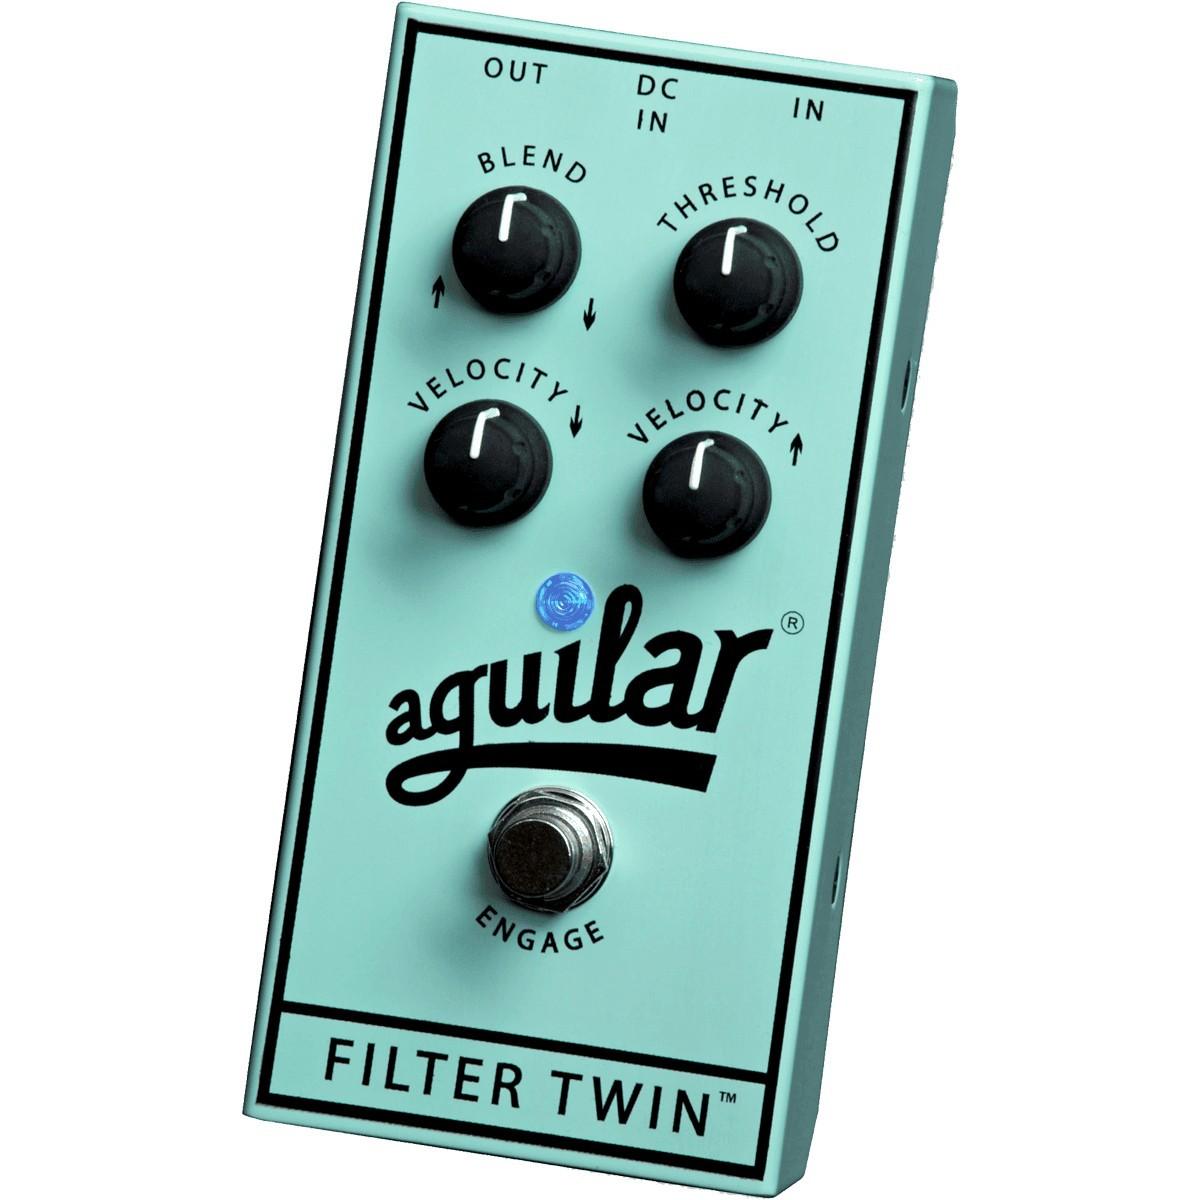 AGUILAR Filter Twin